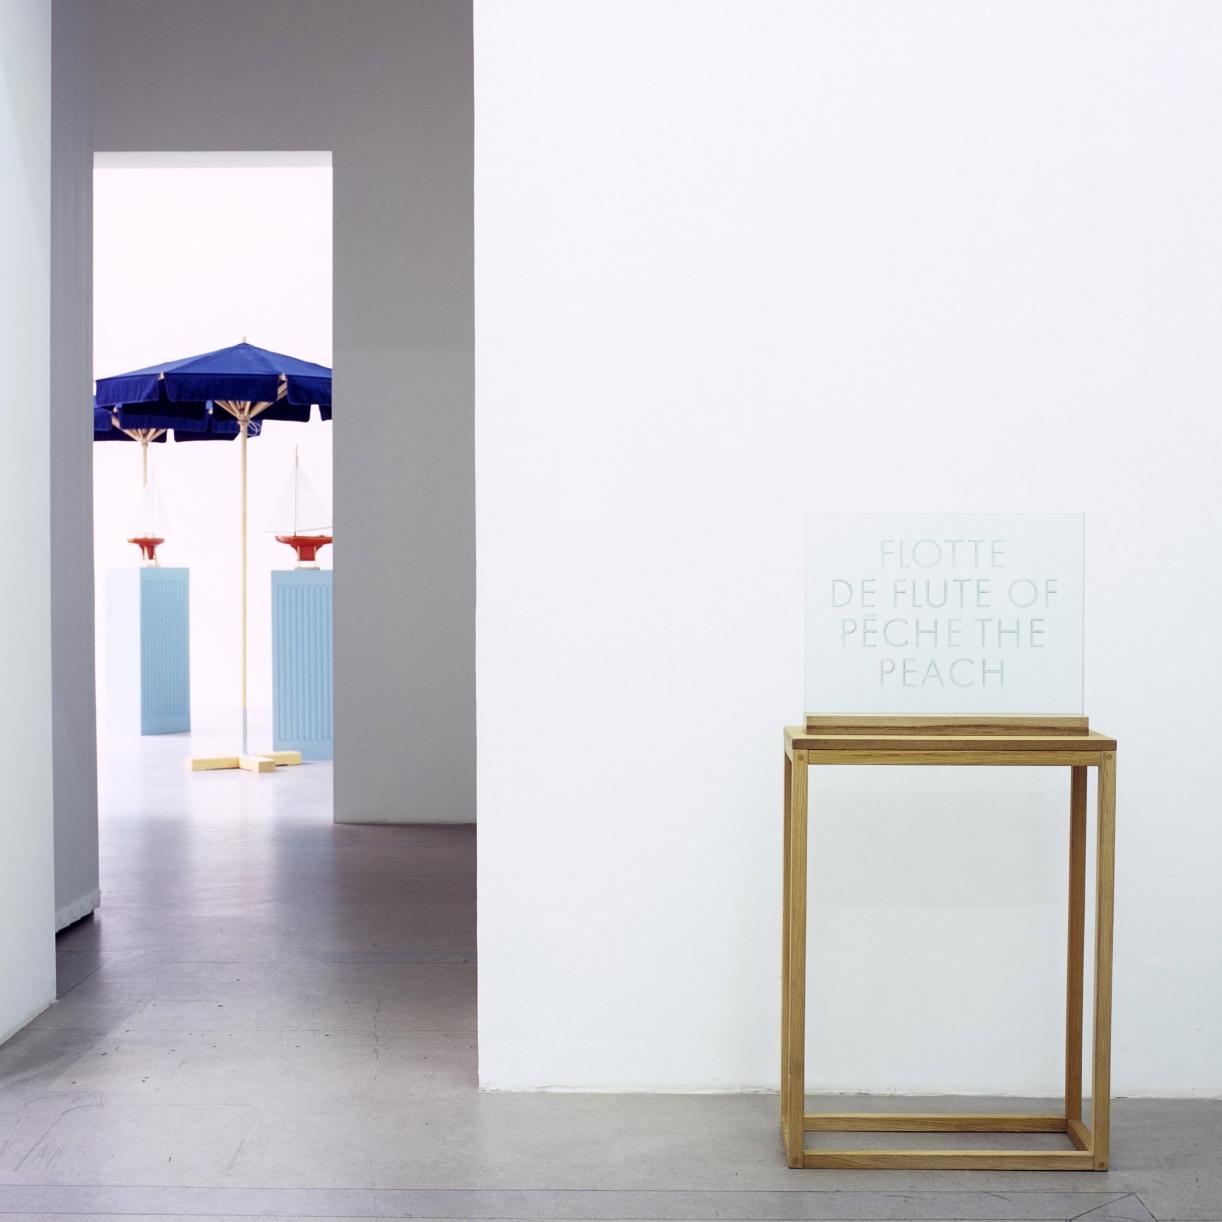 Flotte de Peche, 1990, Engraved glass, wooden stand, 40 x 51 x 10 cm